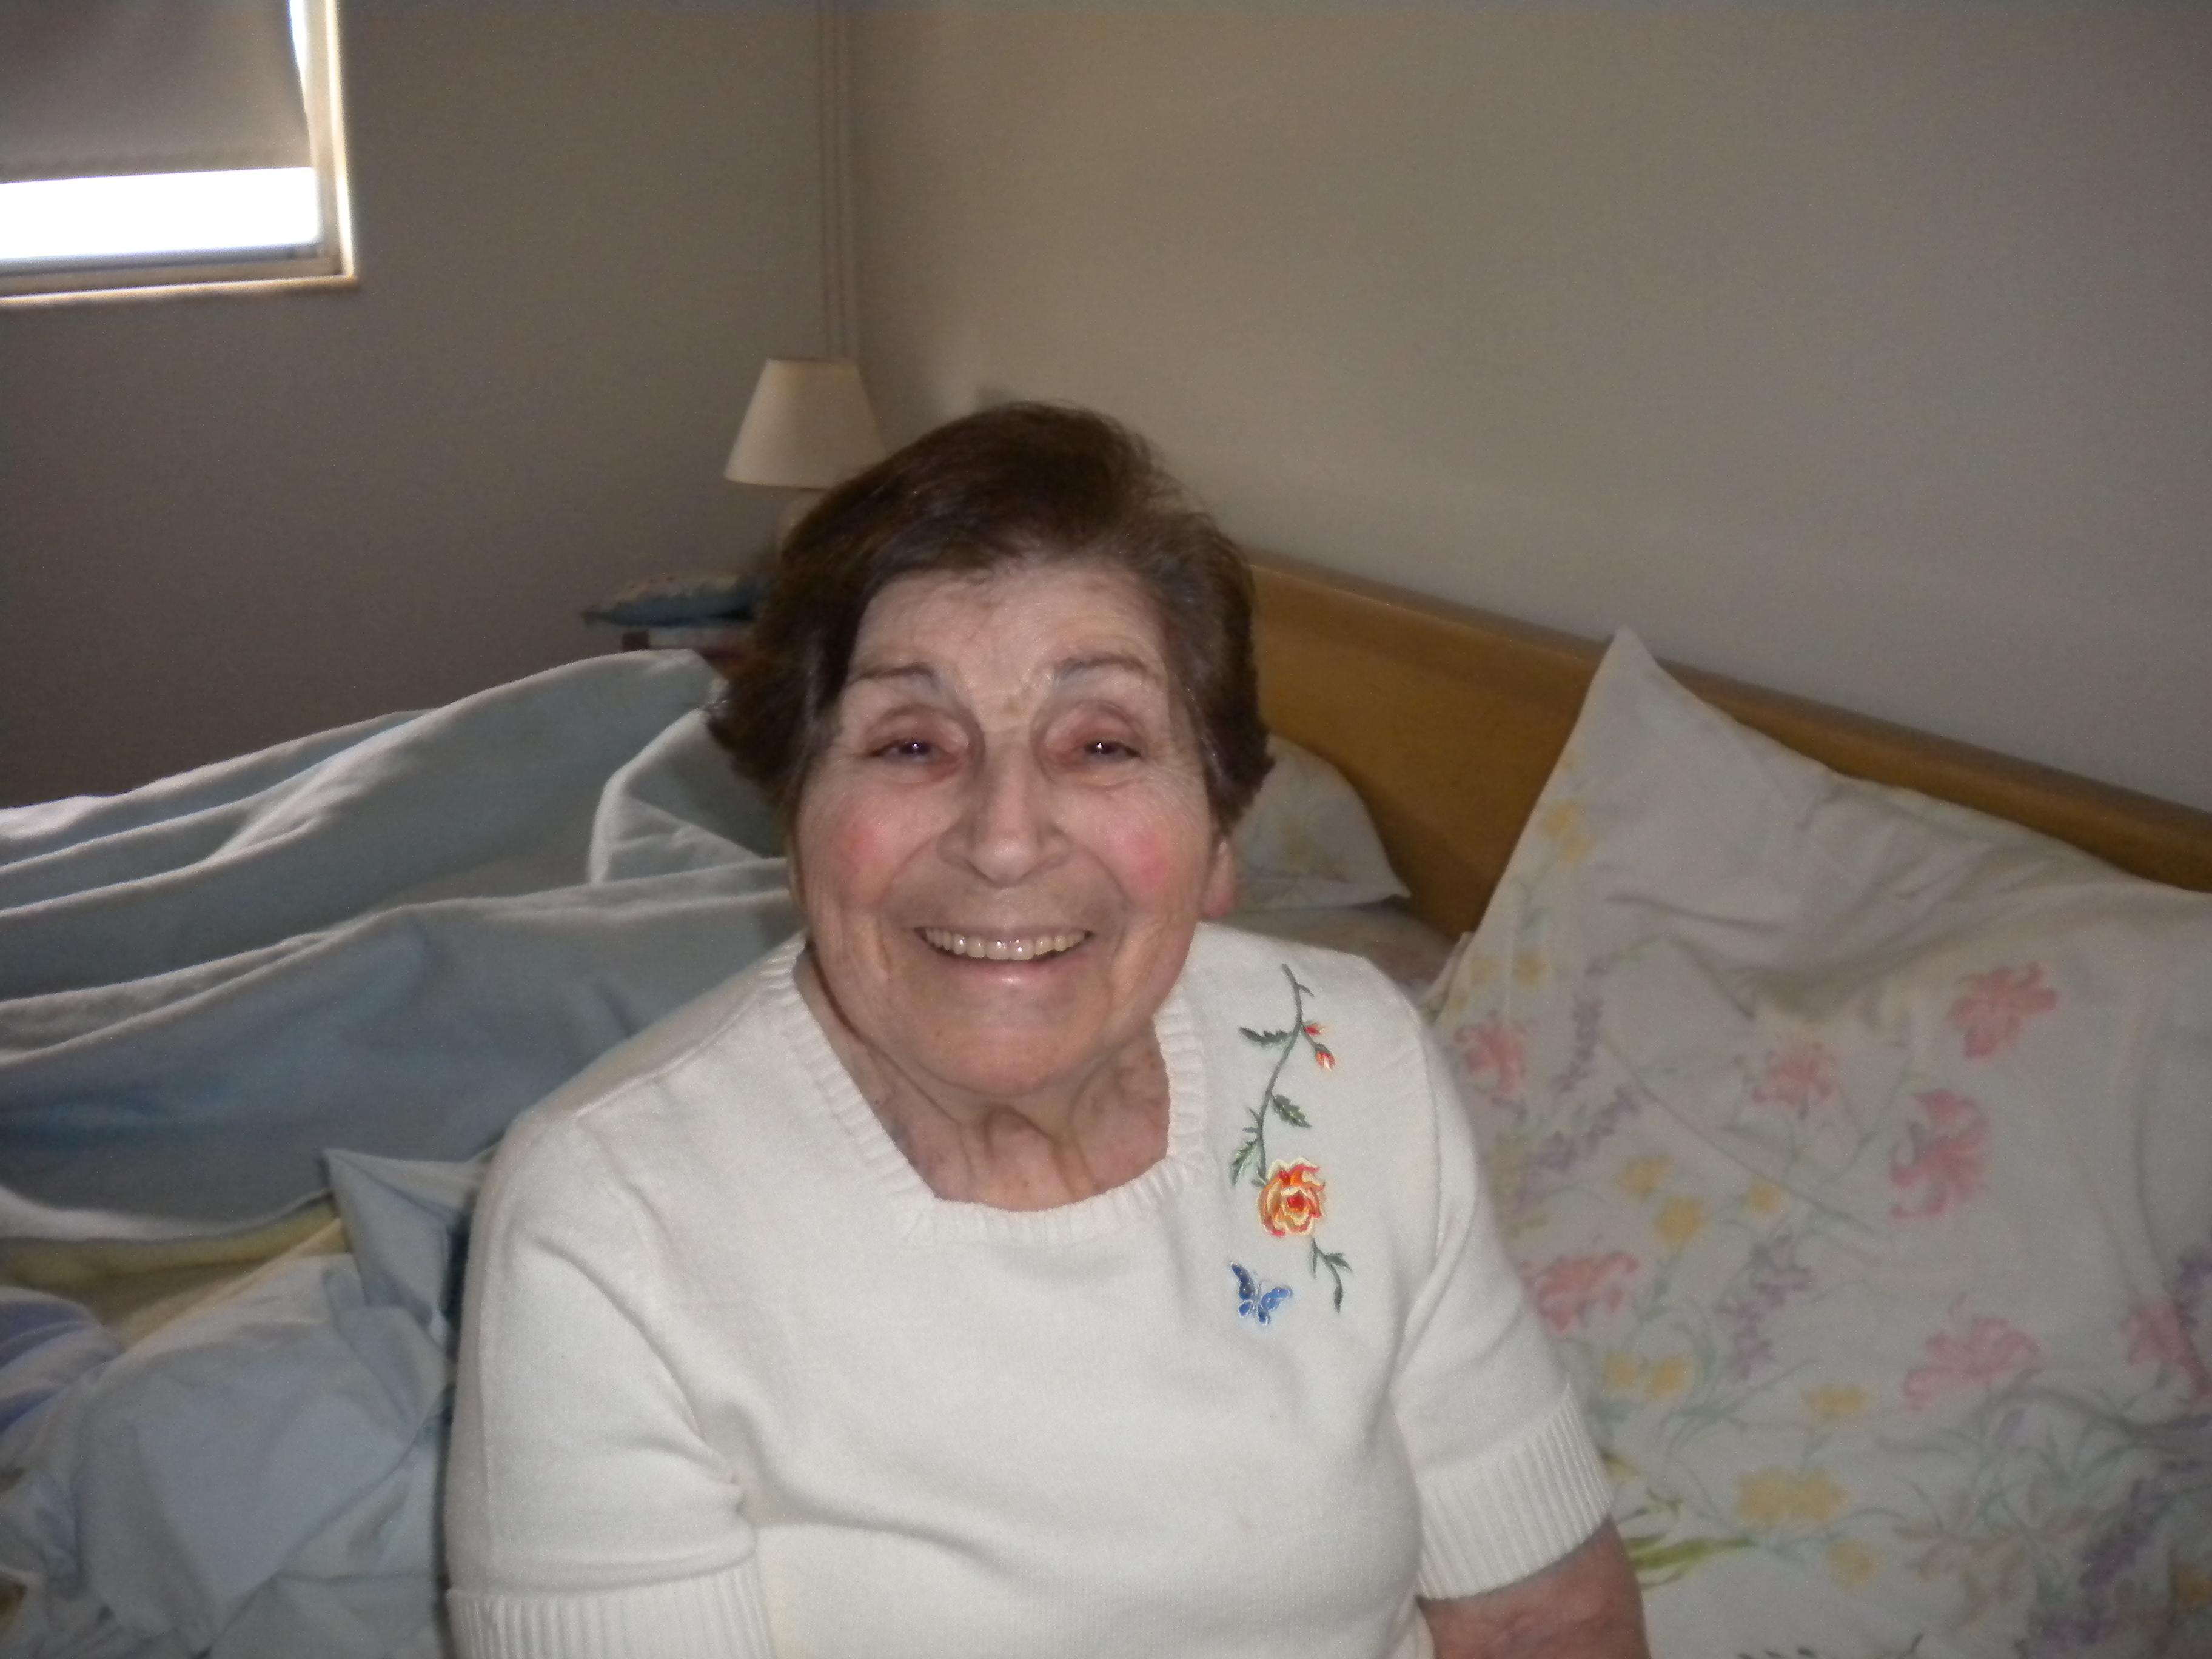 caregiving, life after 50, boomer women, aging